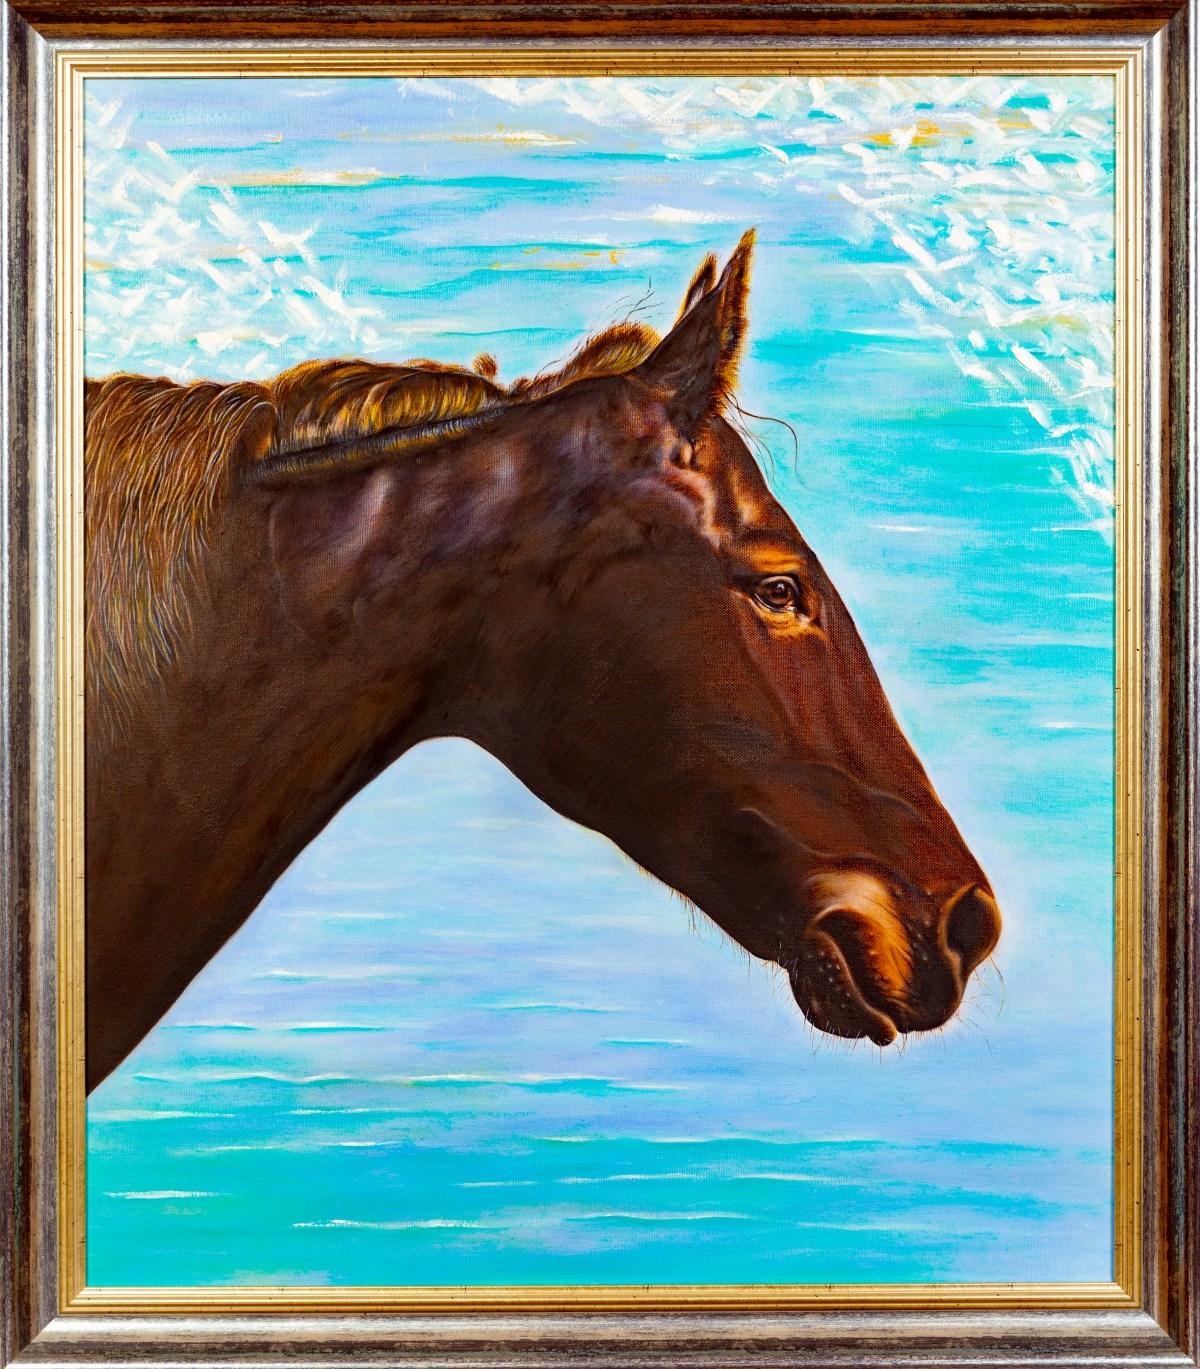 Horse, pt 2. Oil, 2016